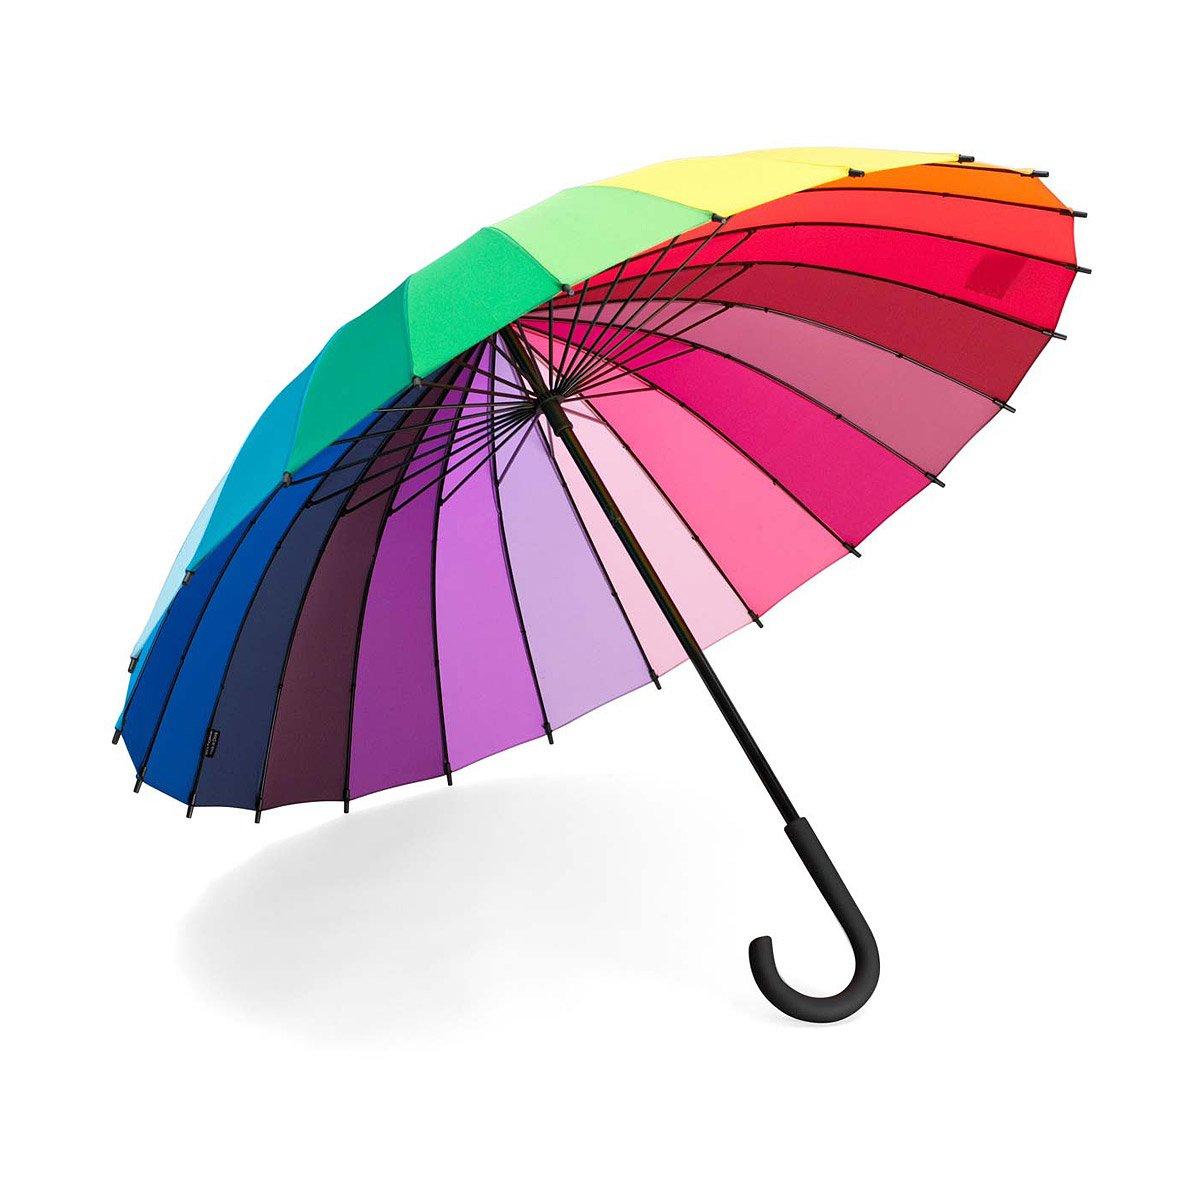 Crimson Heart Umbrella | heart shaped umbrella, rain gear ...